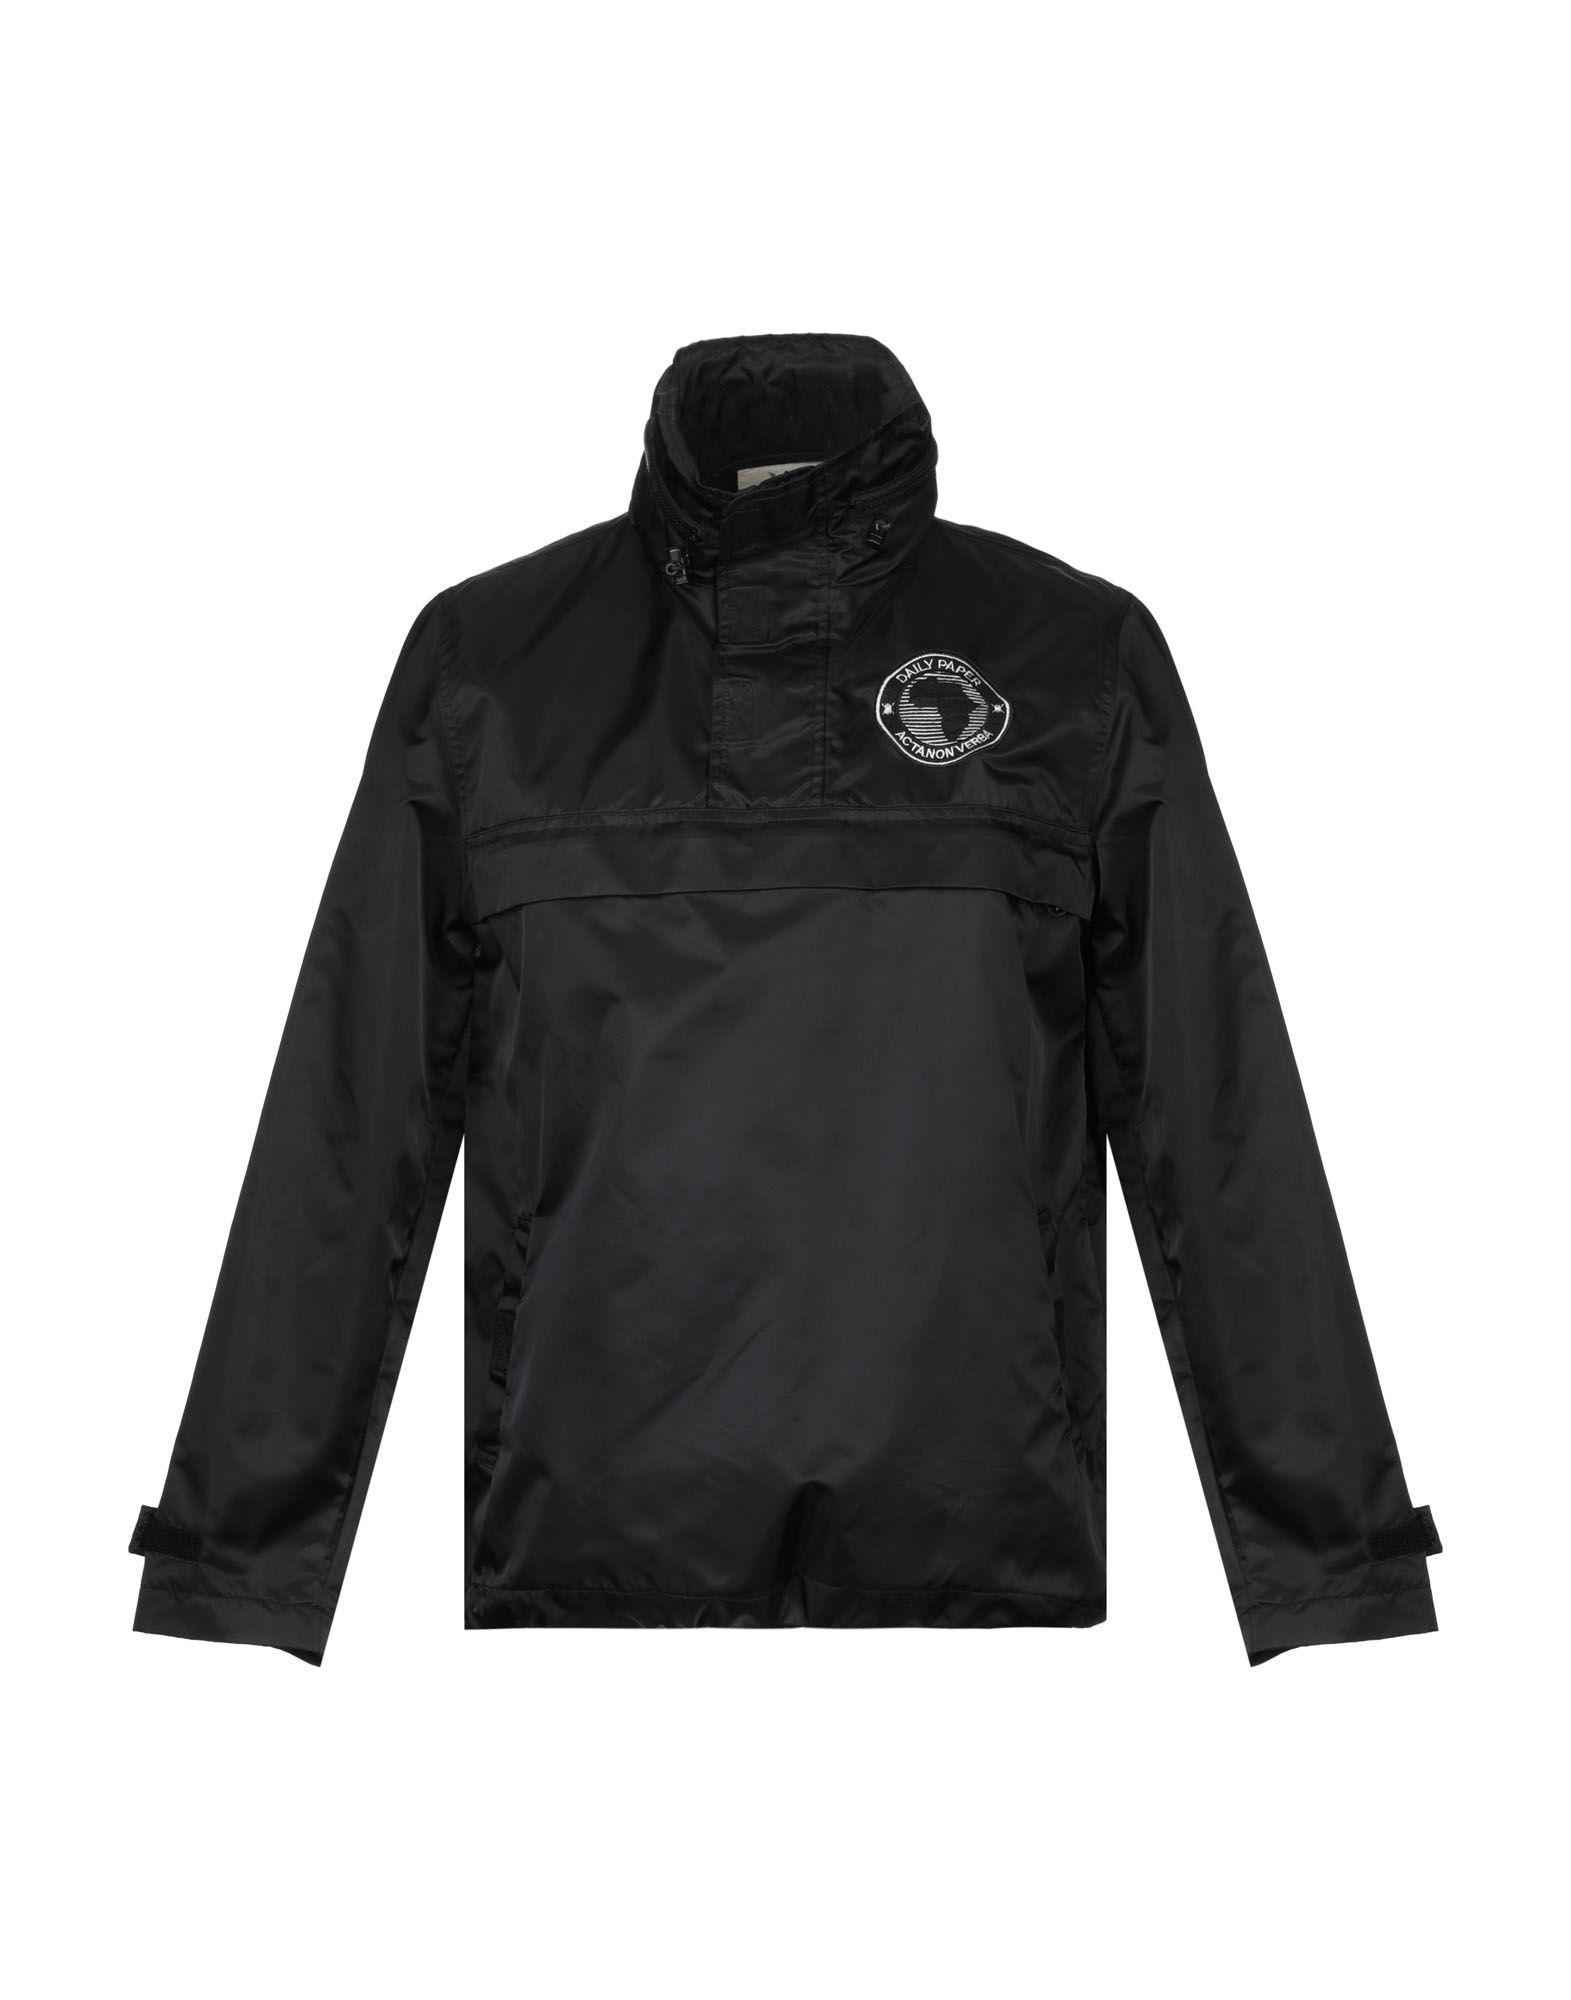 DAILY PAPER Куртка daily paper черная куртка карго